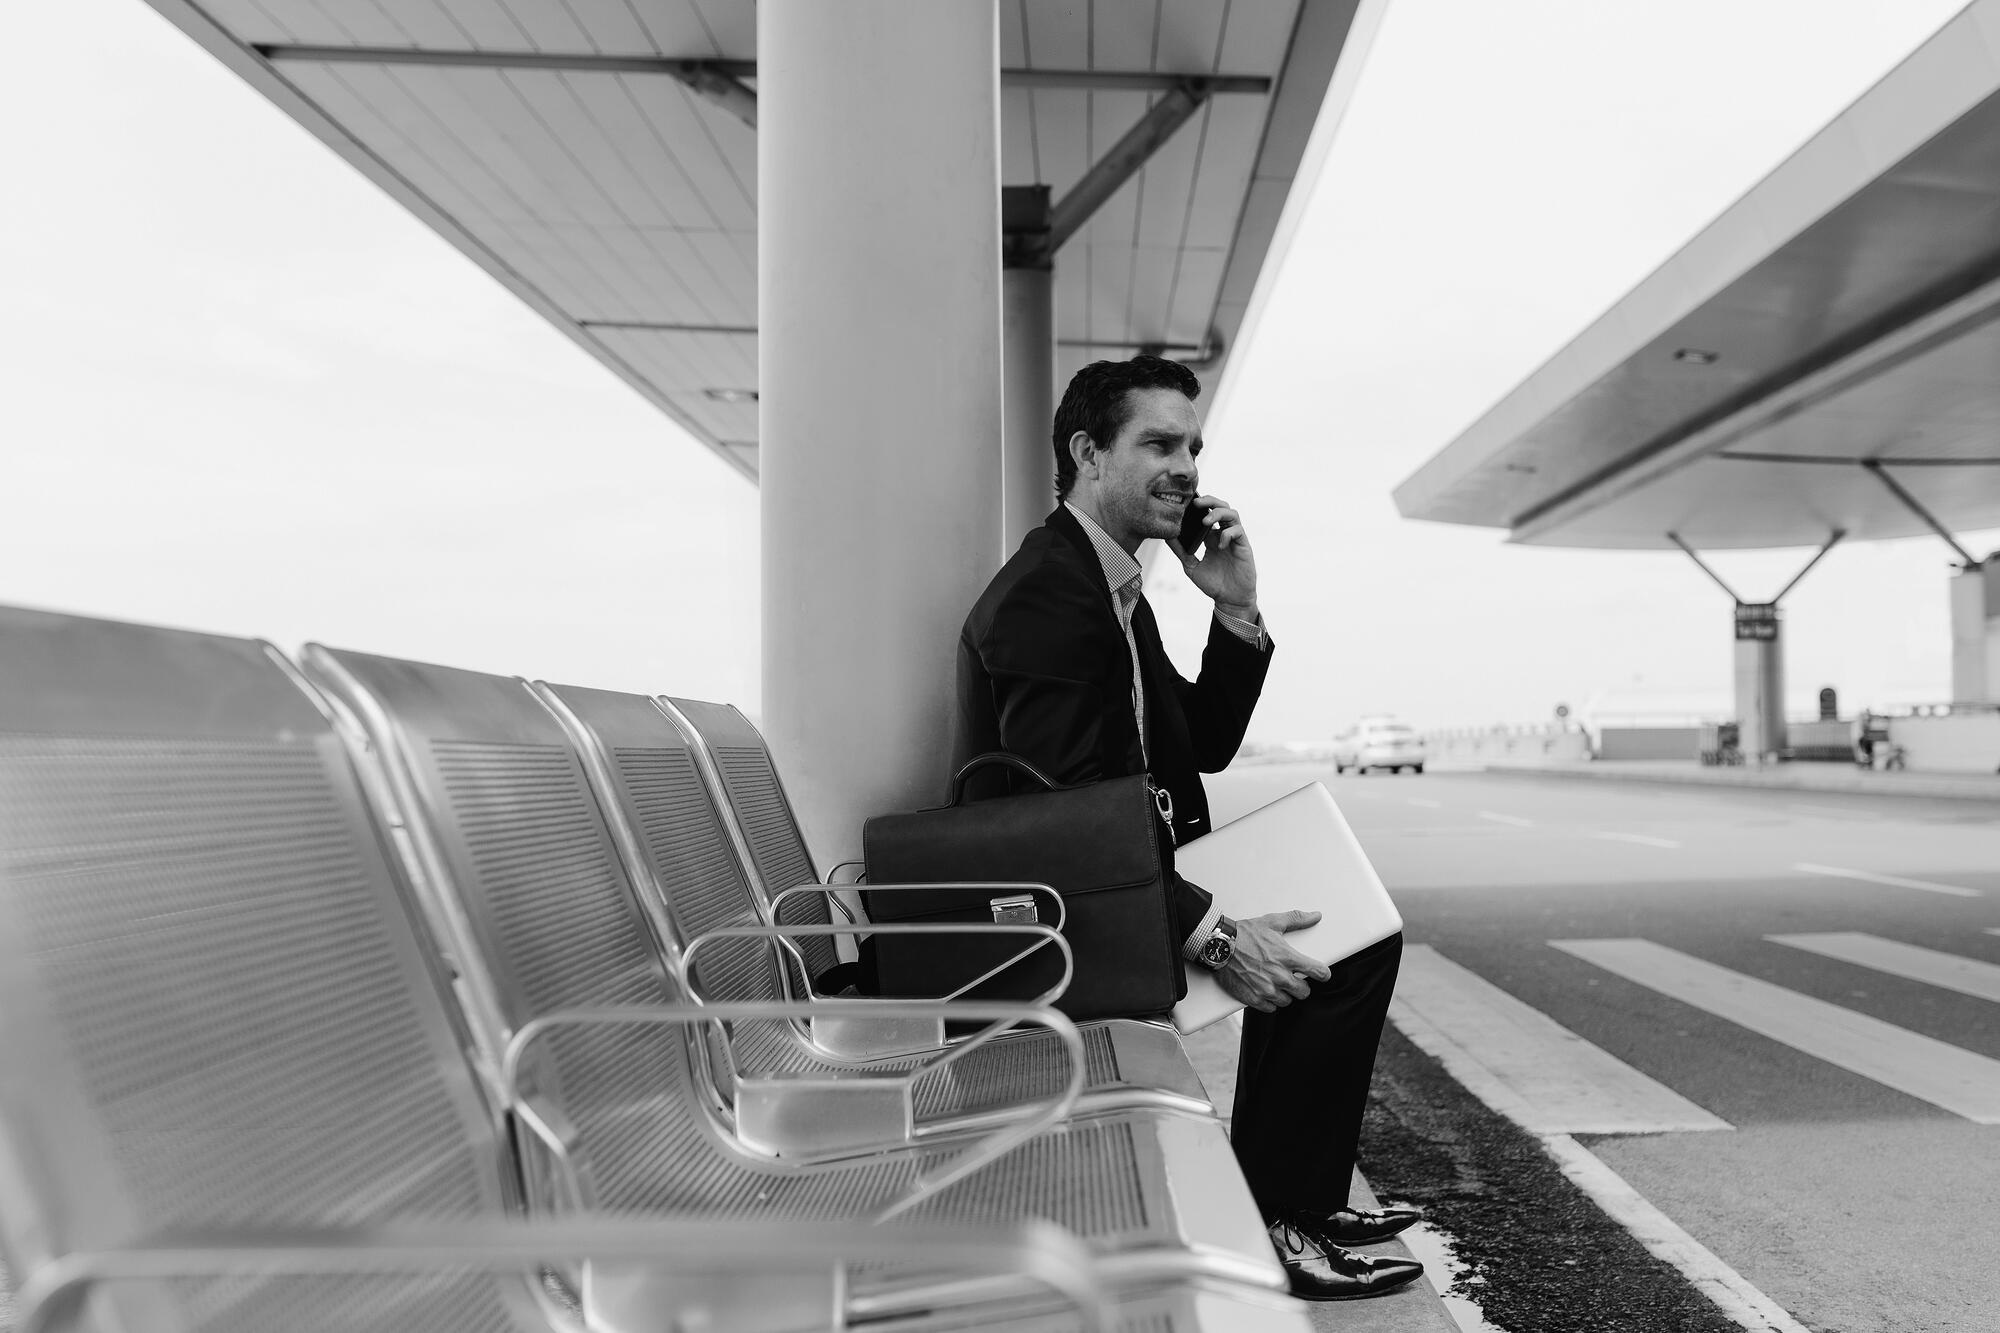 Guy-at-Airport